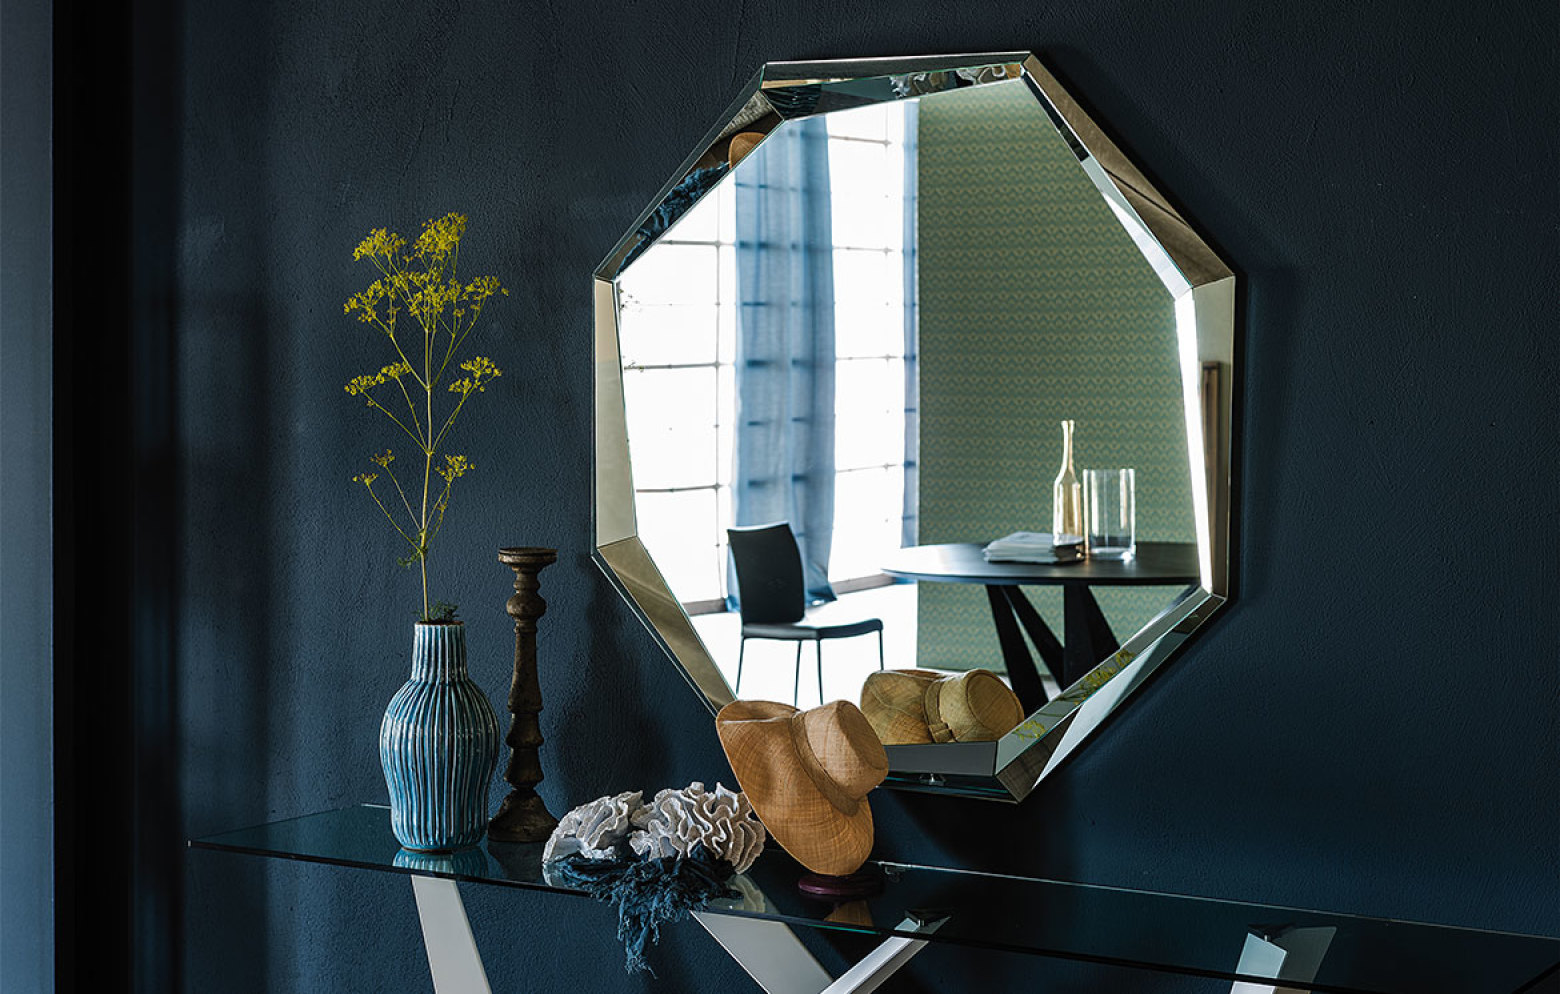 Emerald spiegel kleinm bel accessoires who 39 s perfect for Wandspiegel design